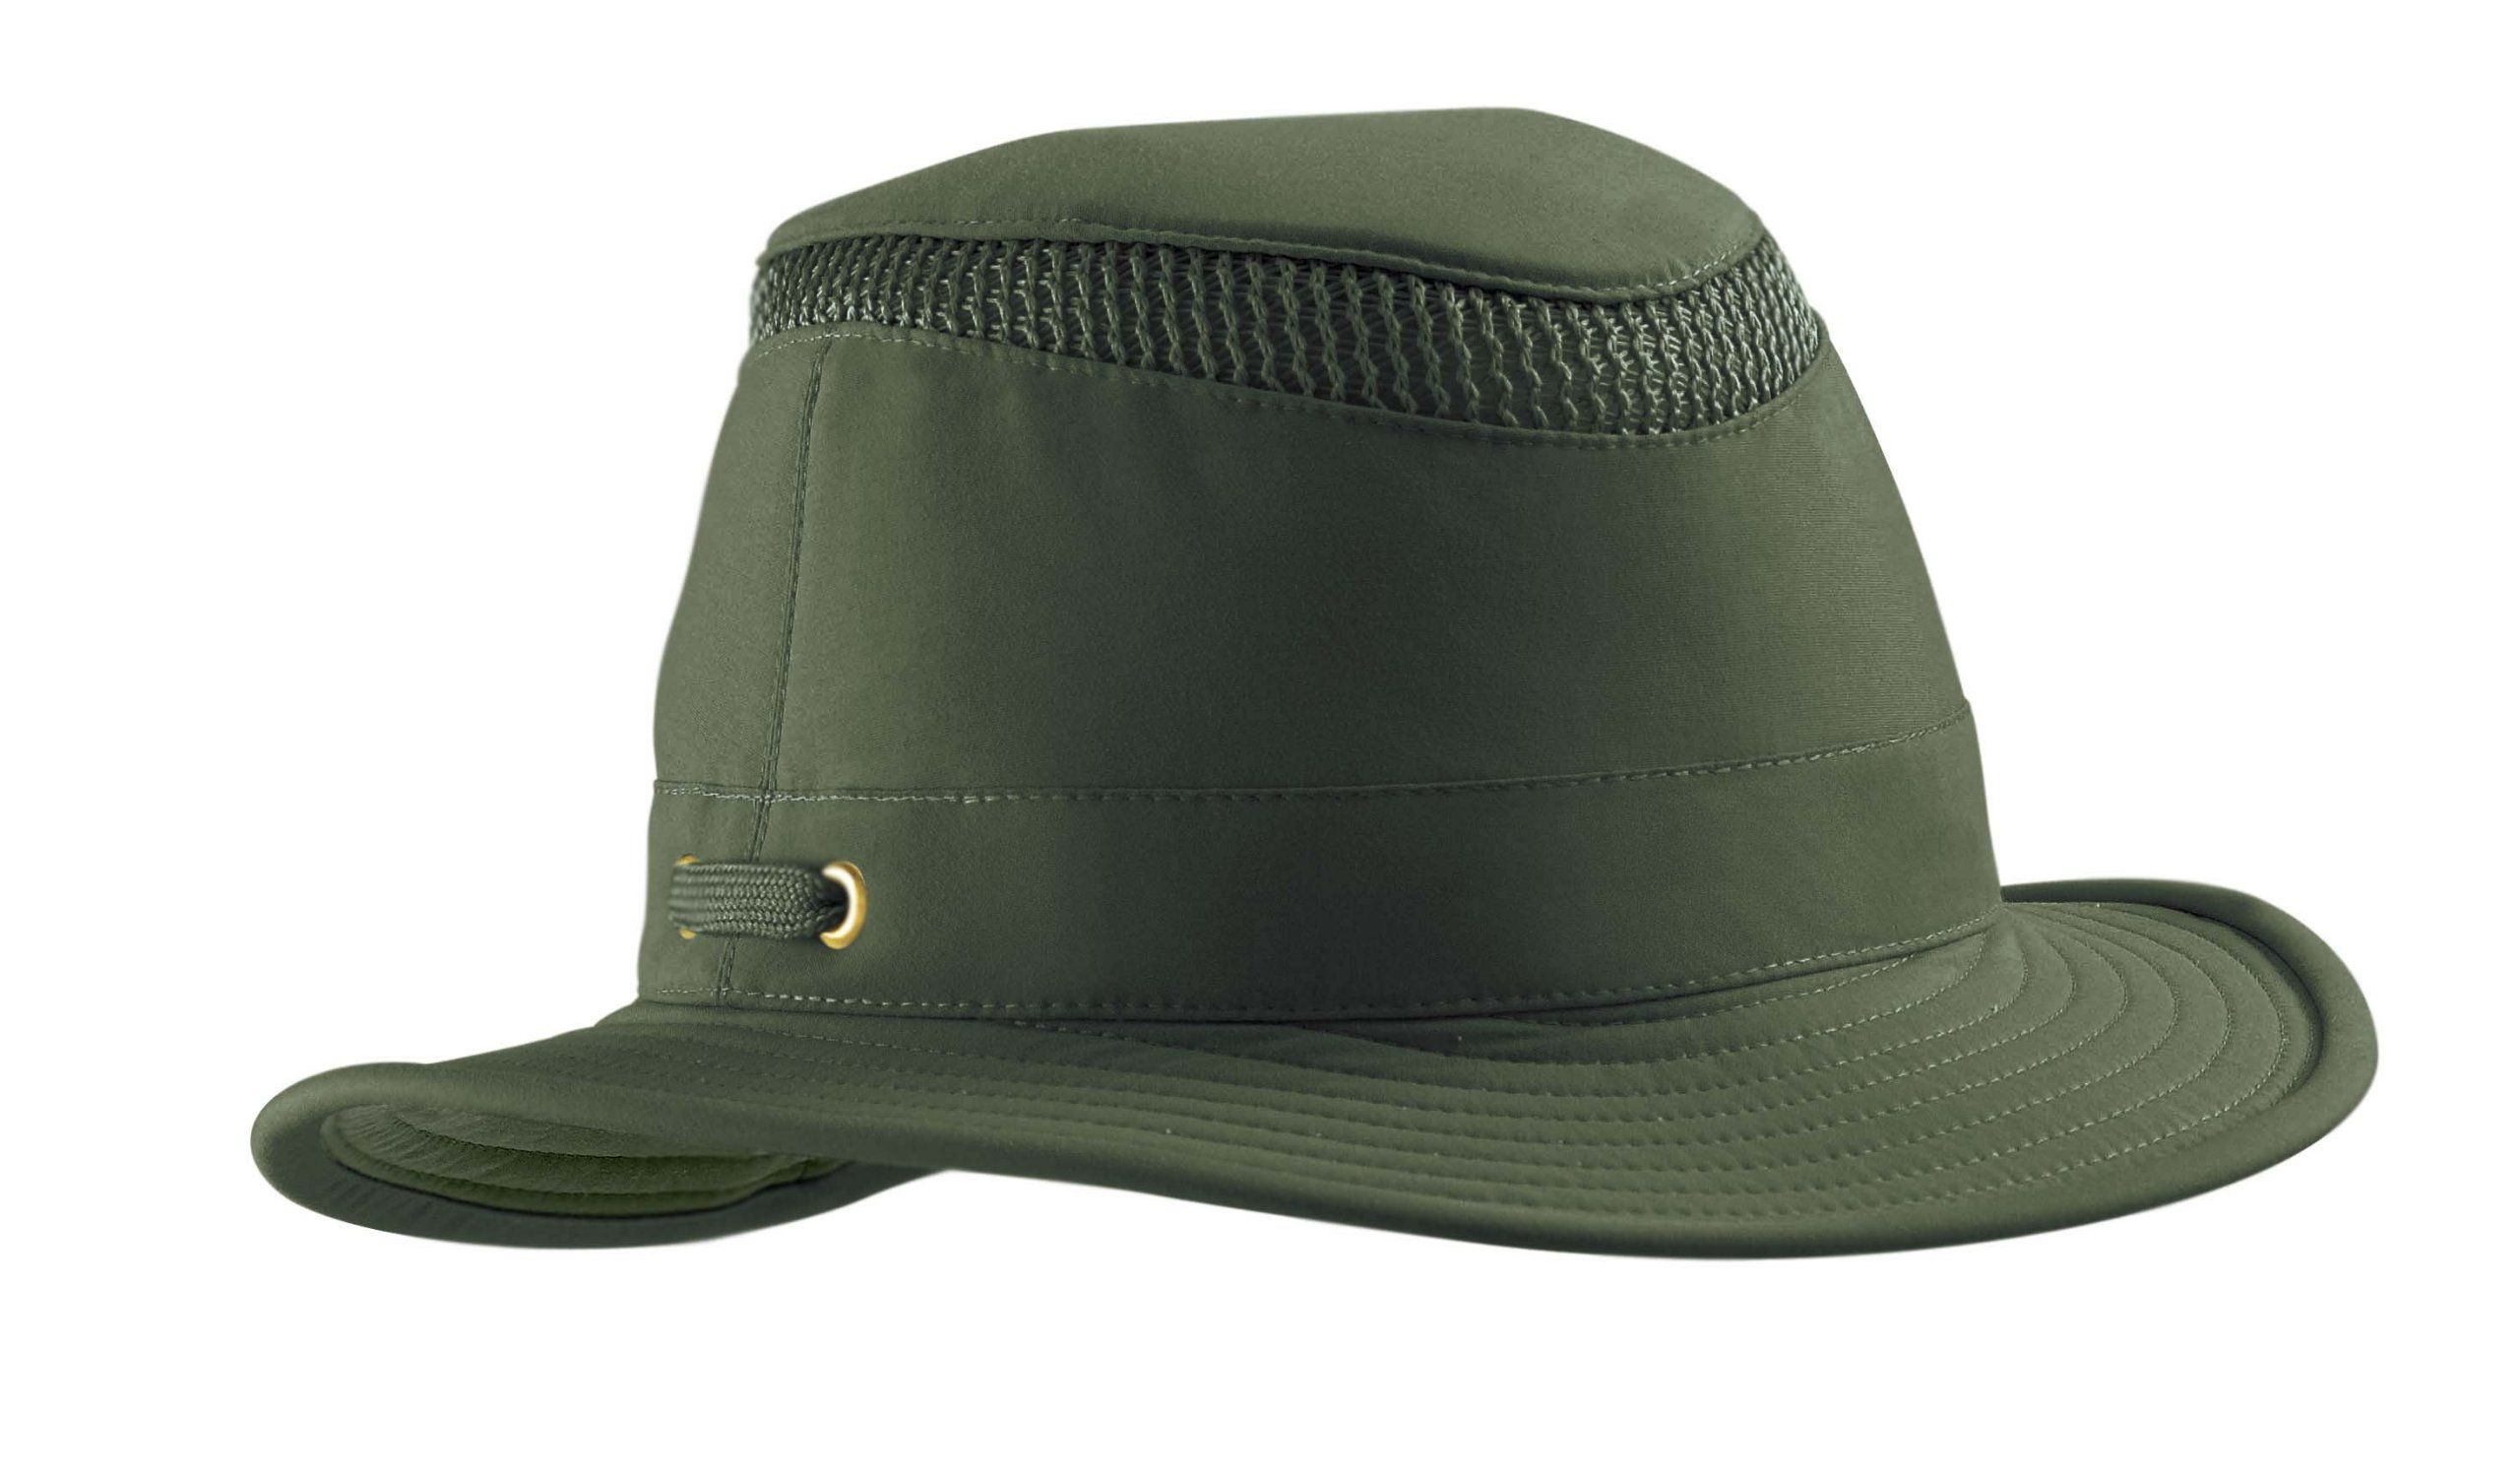 a9a78cdb370 Tilley unisex adult airflo hat olive supplex nylon jpg 2560x1503 Uva hats